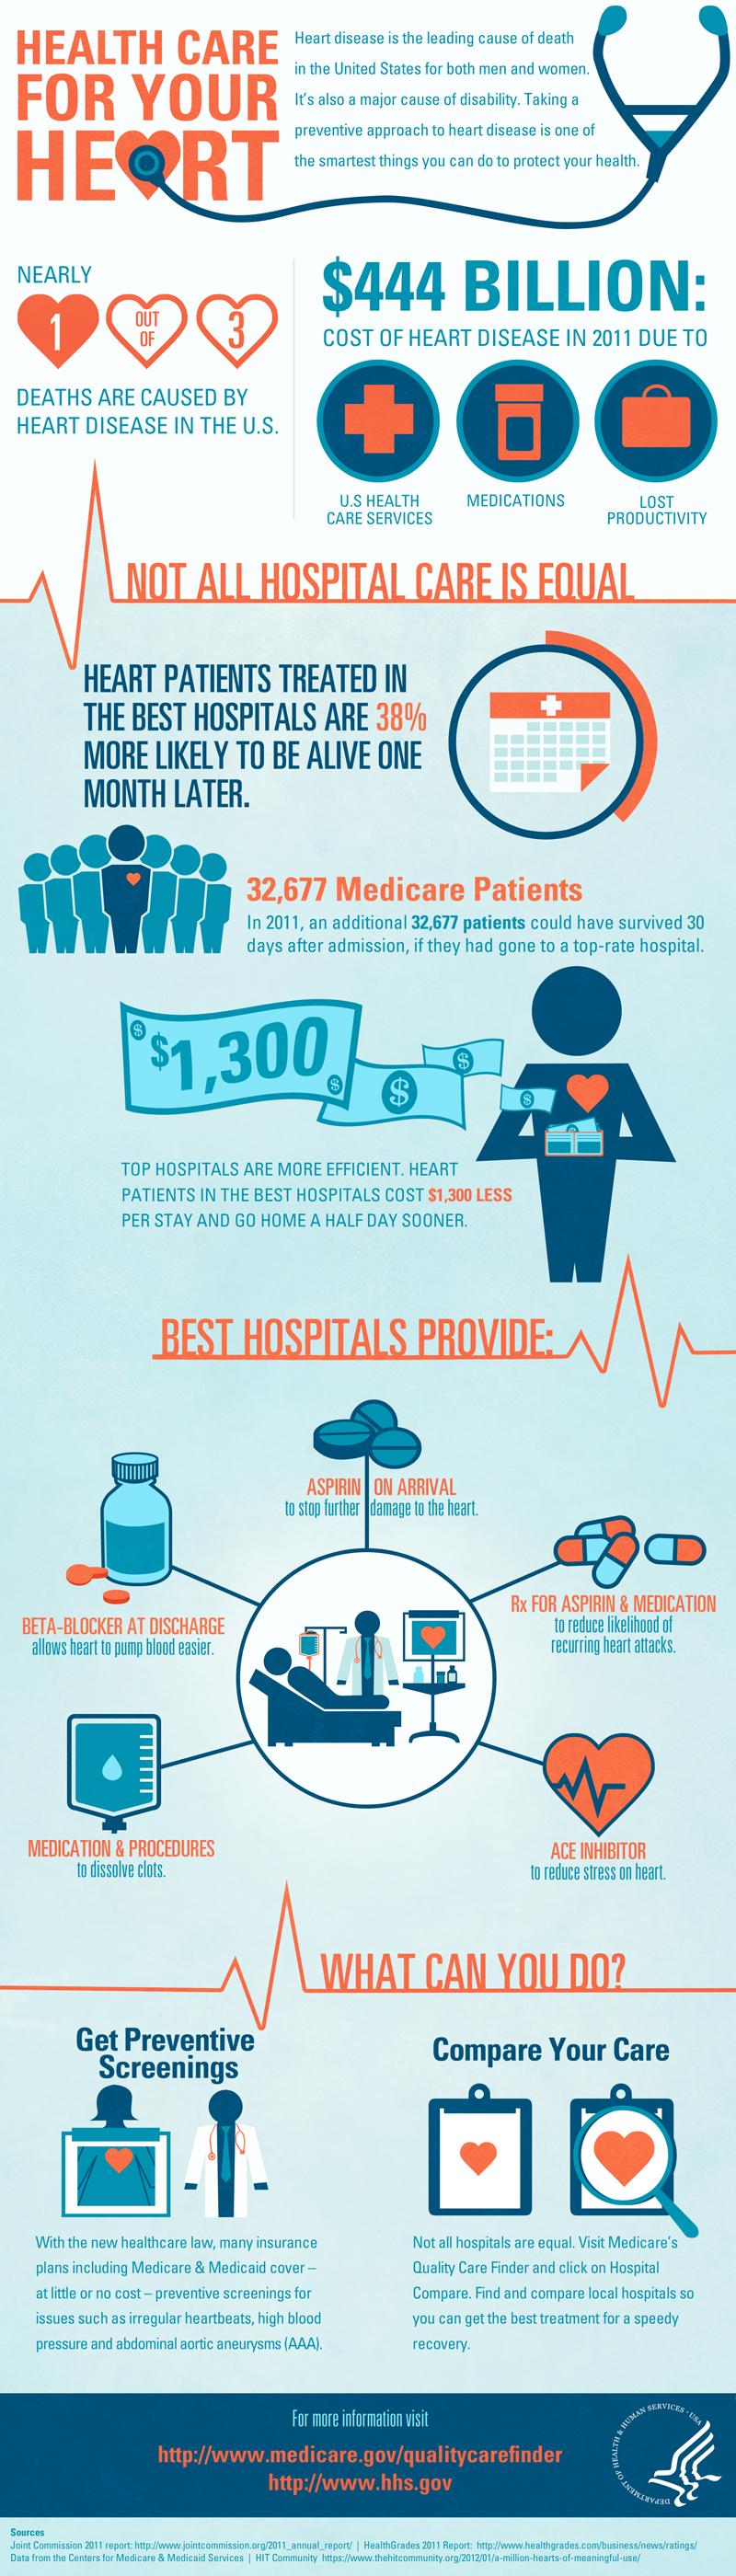 Heart Disease and Treatment Statistics